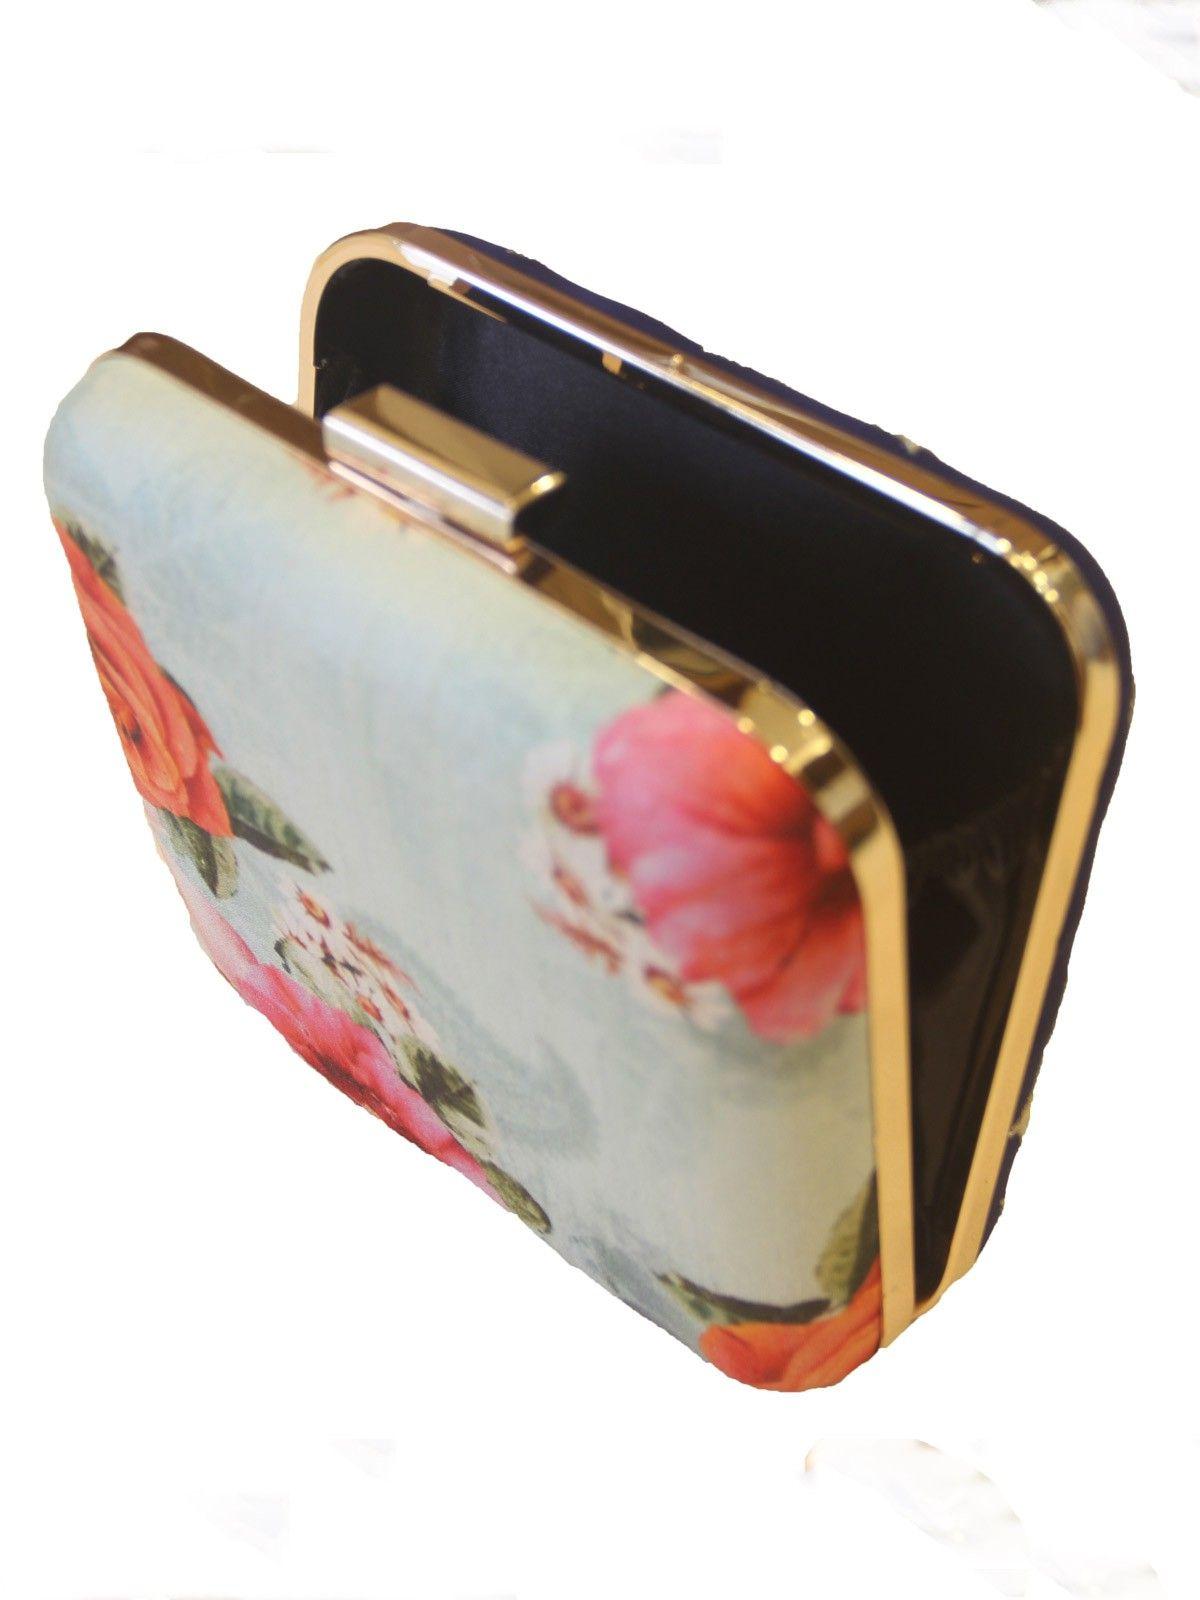 Floral digital print handloom fabric  women's applique clutch